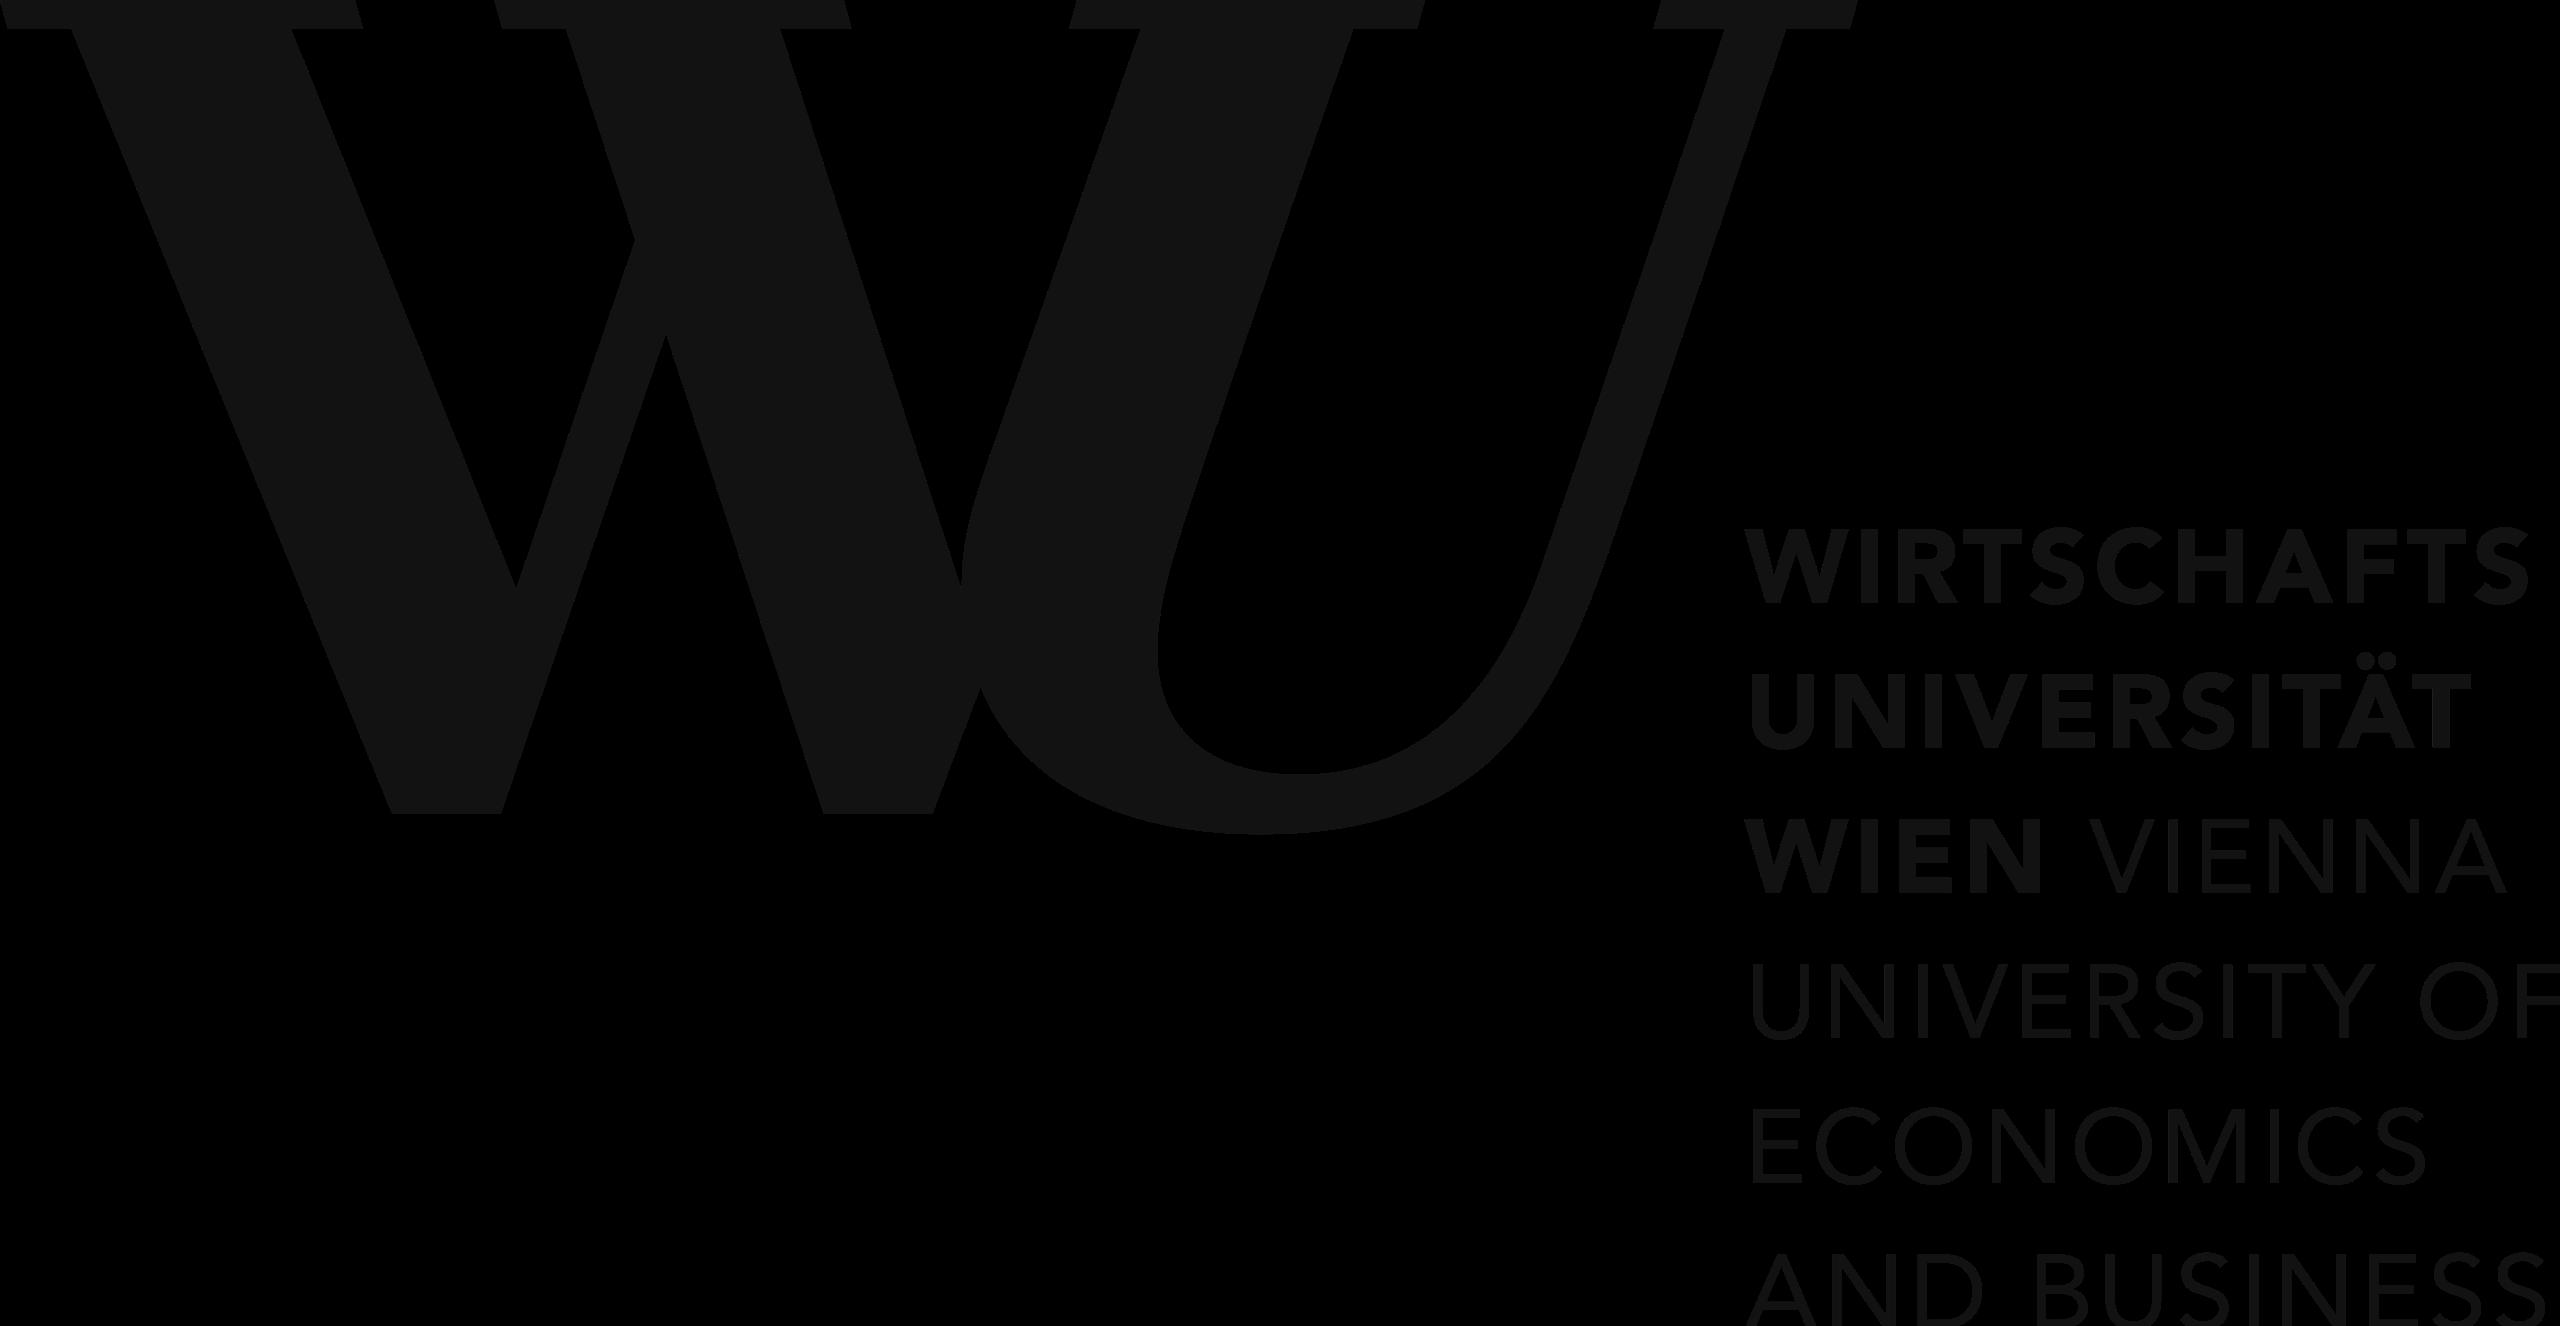 Vienna University of Economics and Business